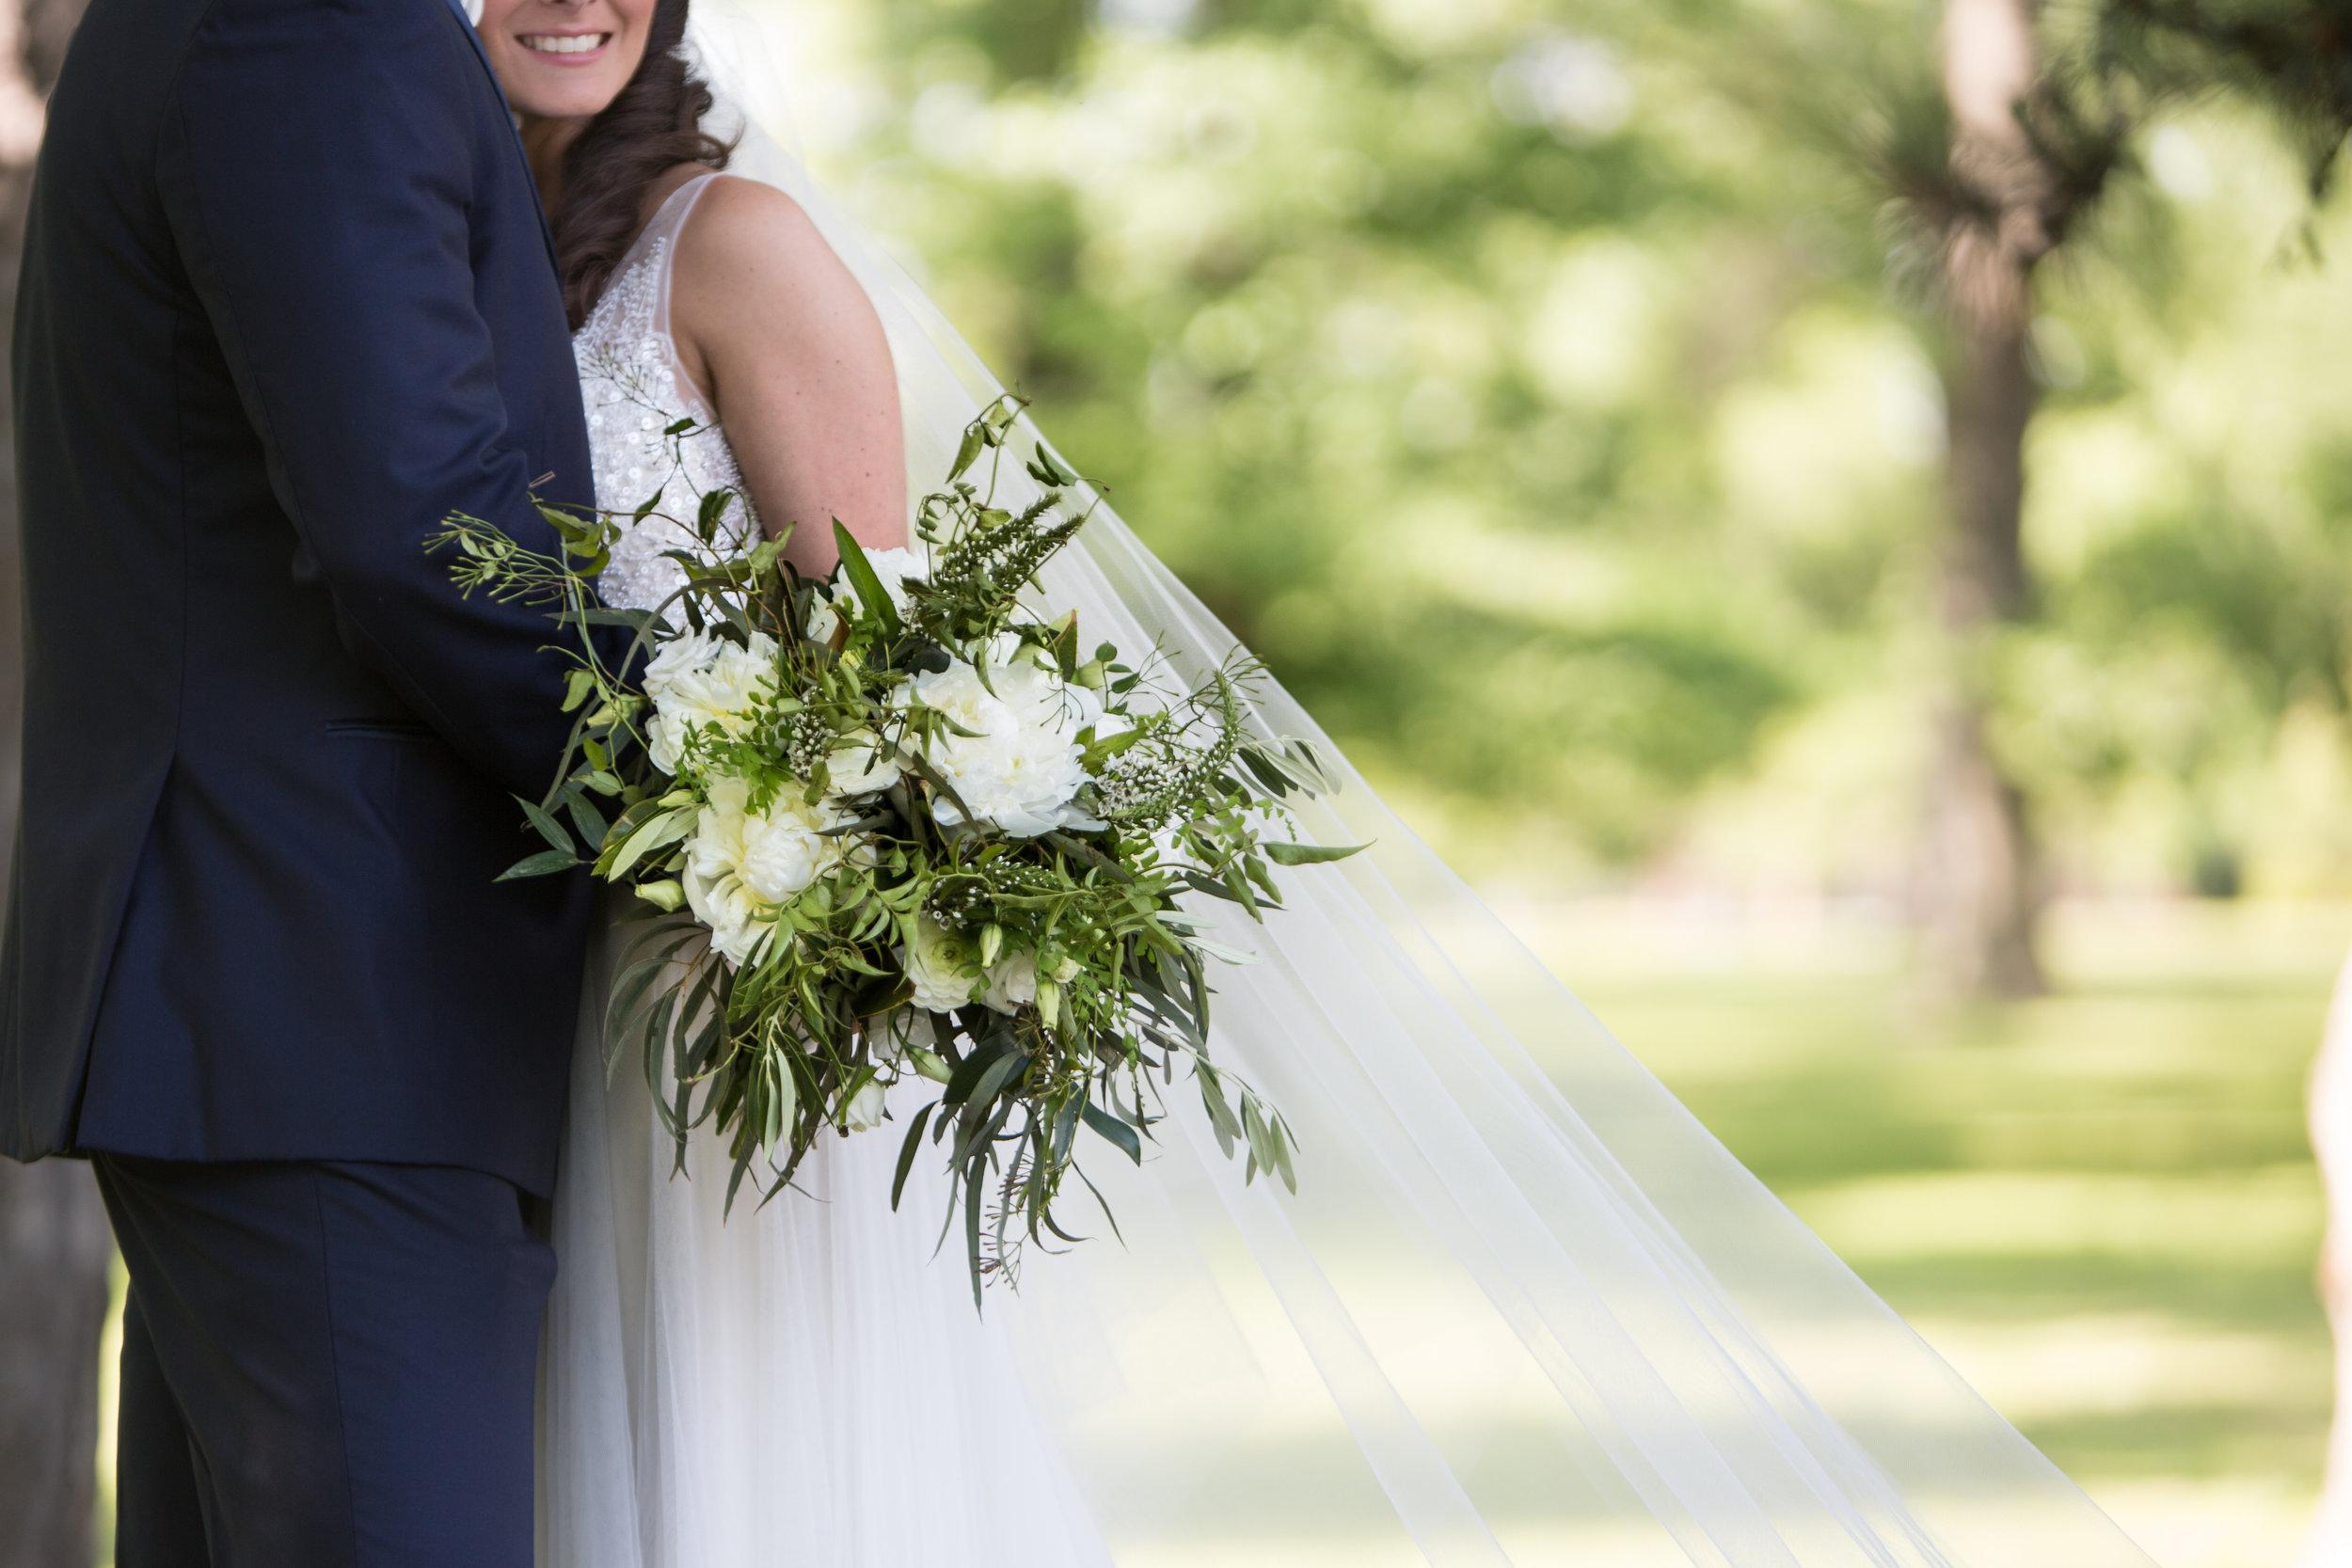 St. Louis Photographer St. Charles Photographer Engagement Wedding Photographer (30).jpg